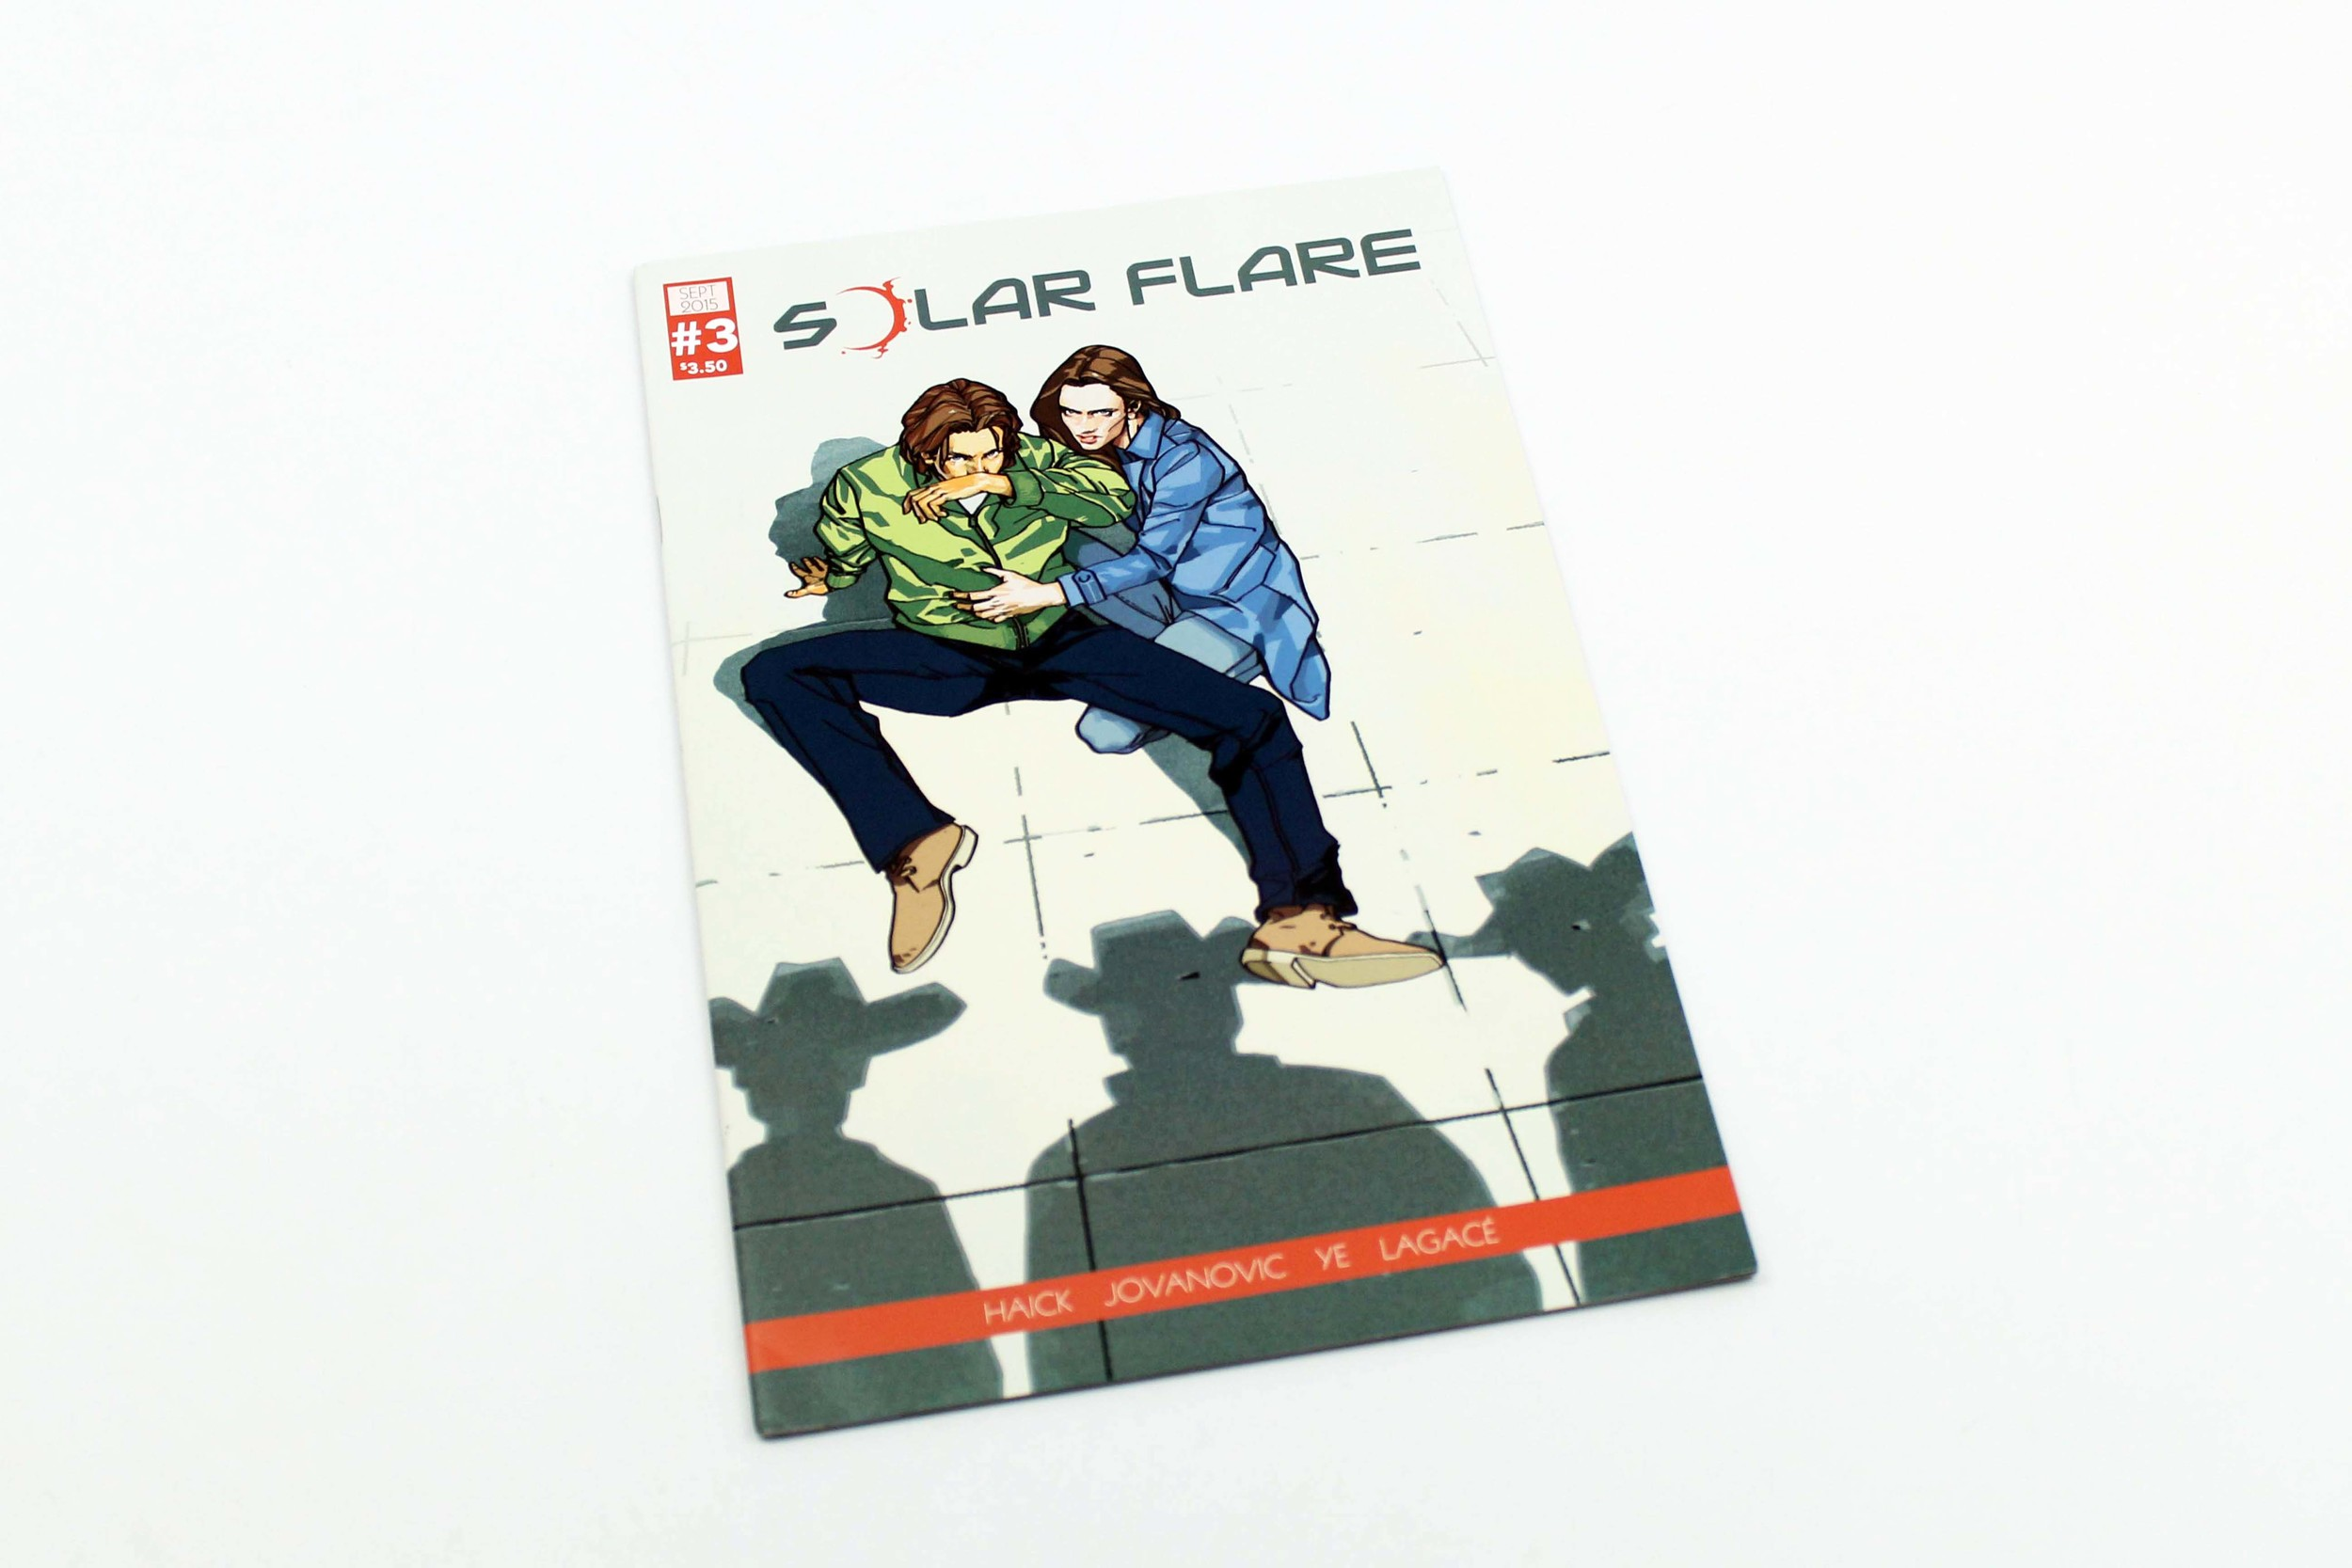 Solar Flare #3 Variant Cover Photo.jpg